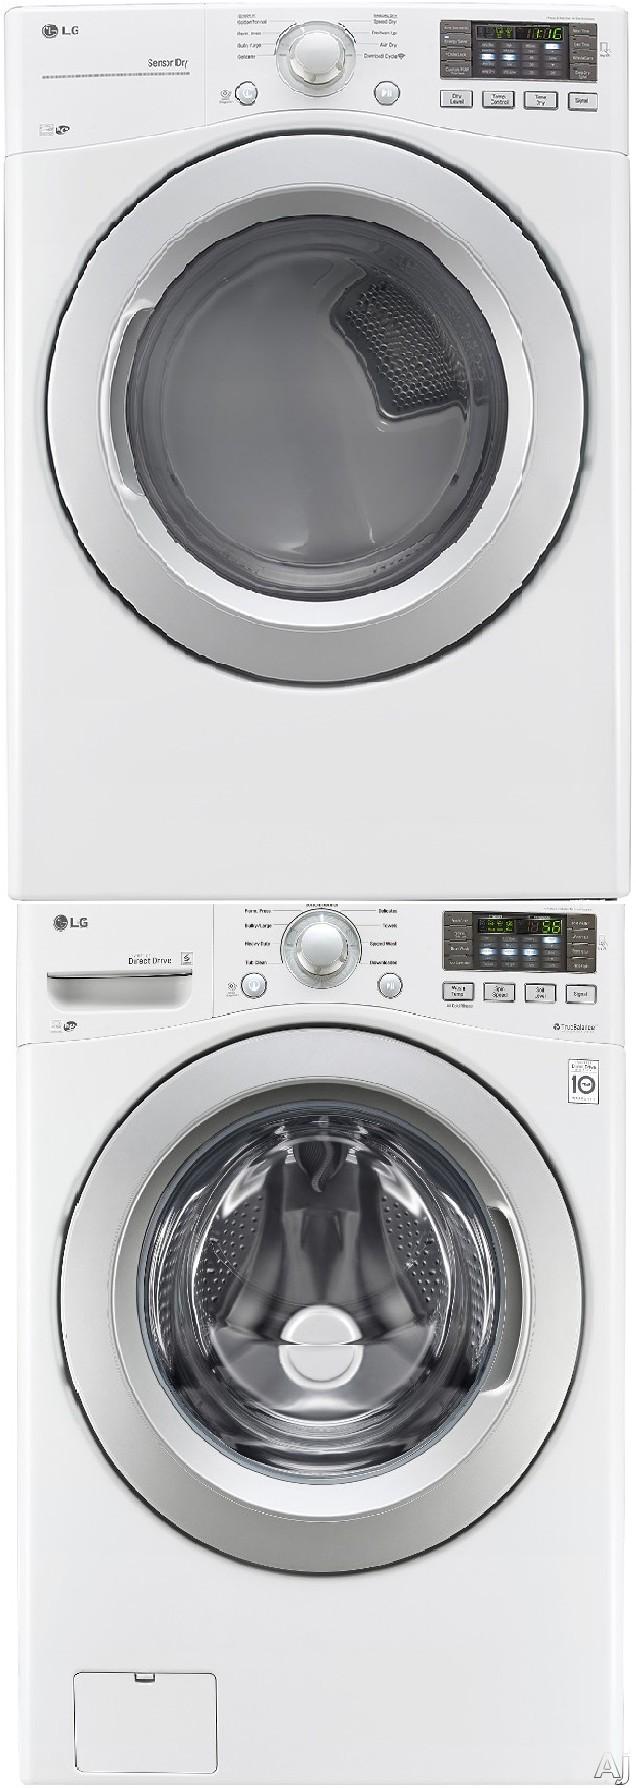 Lg Washer Dryer Manufacturer Rebate ~ Lg washer dryer usa